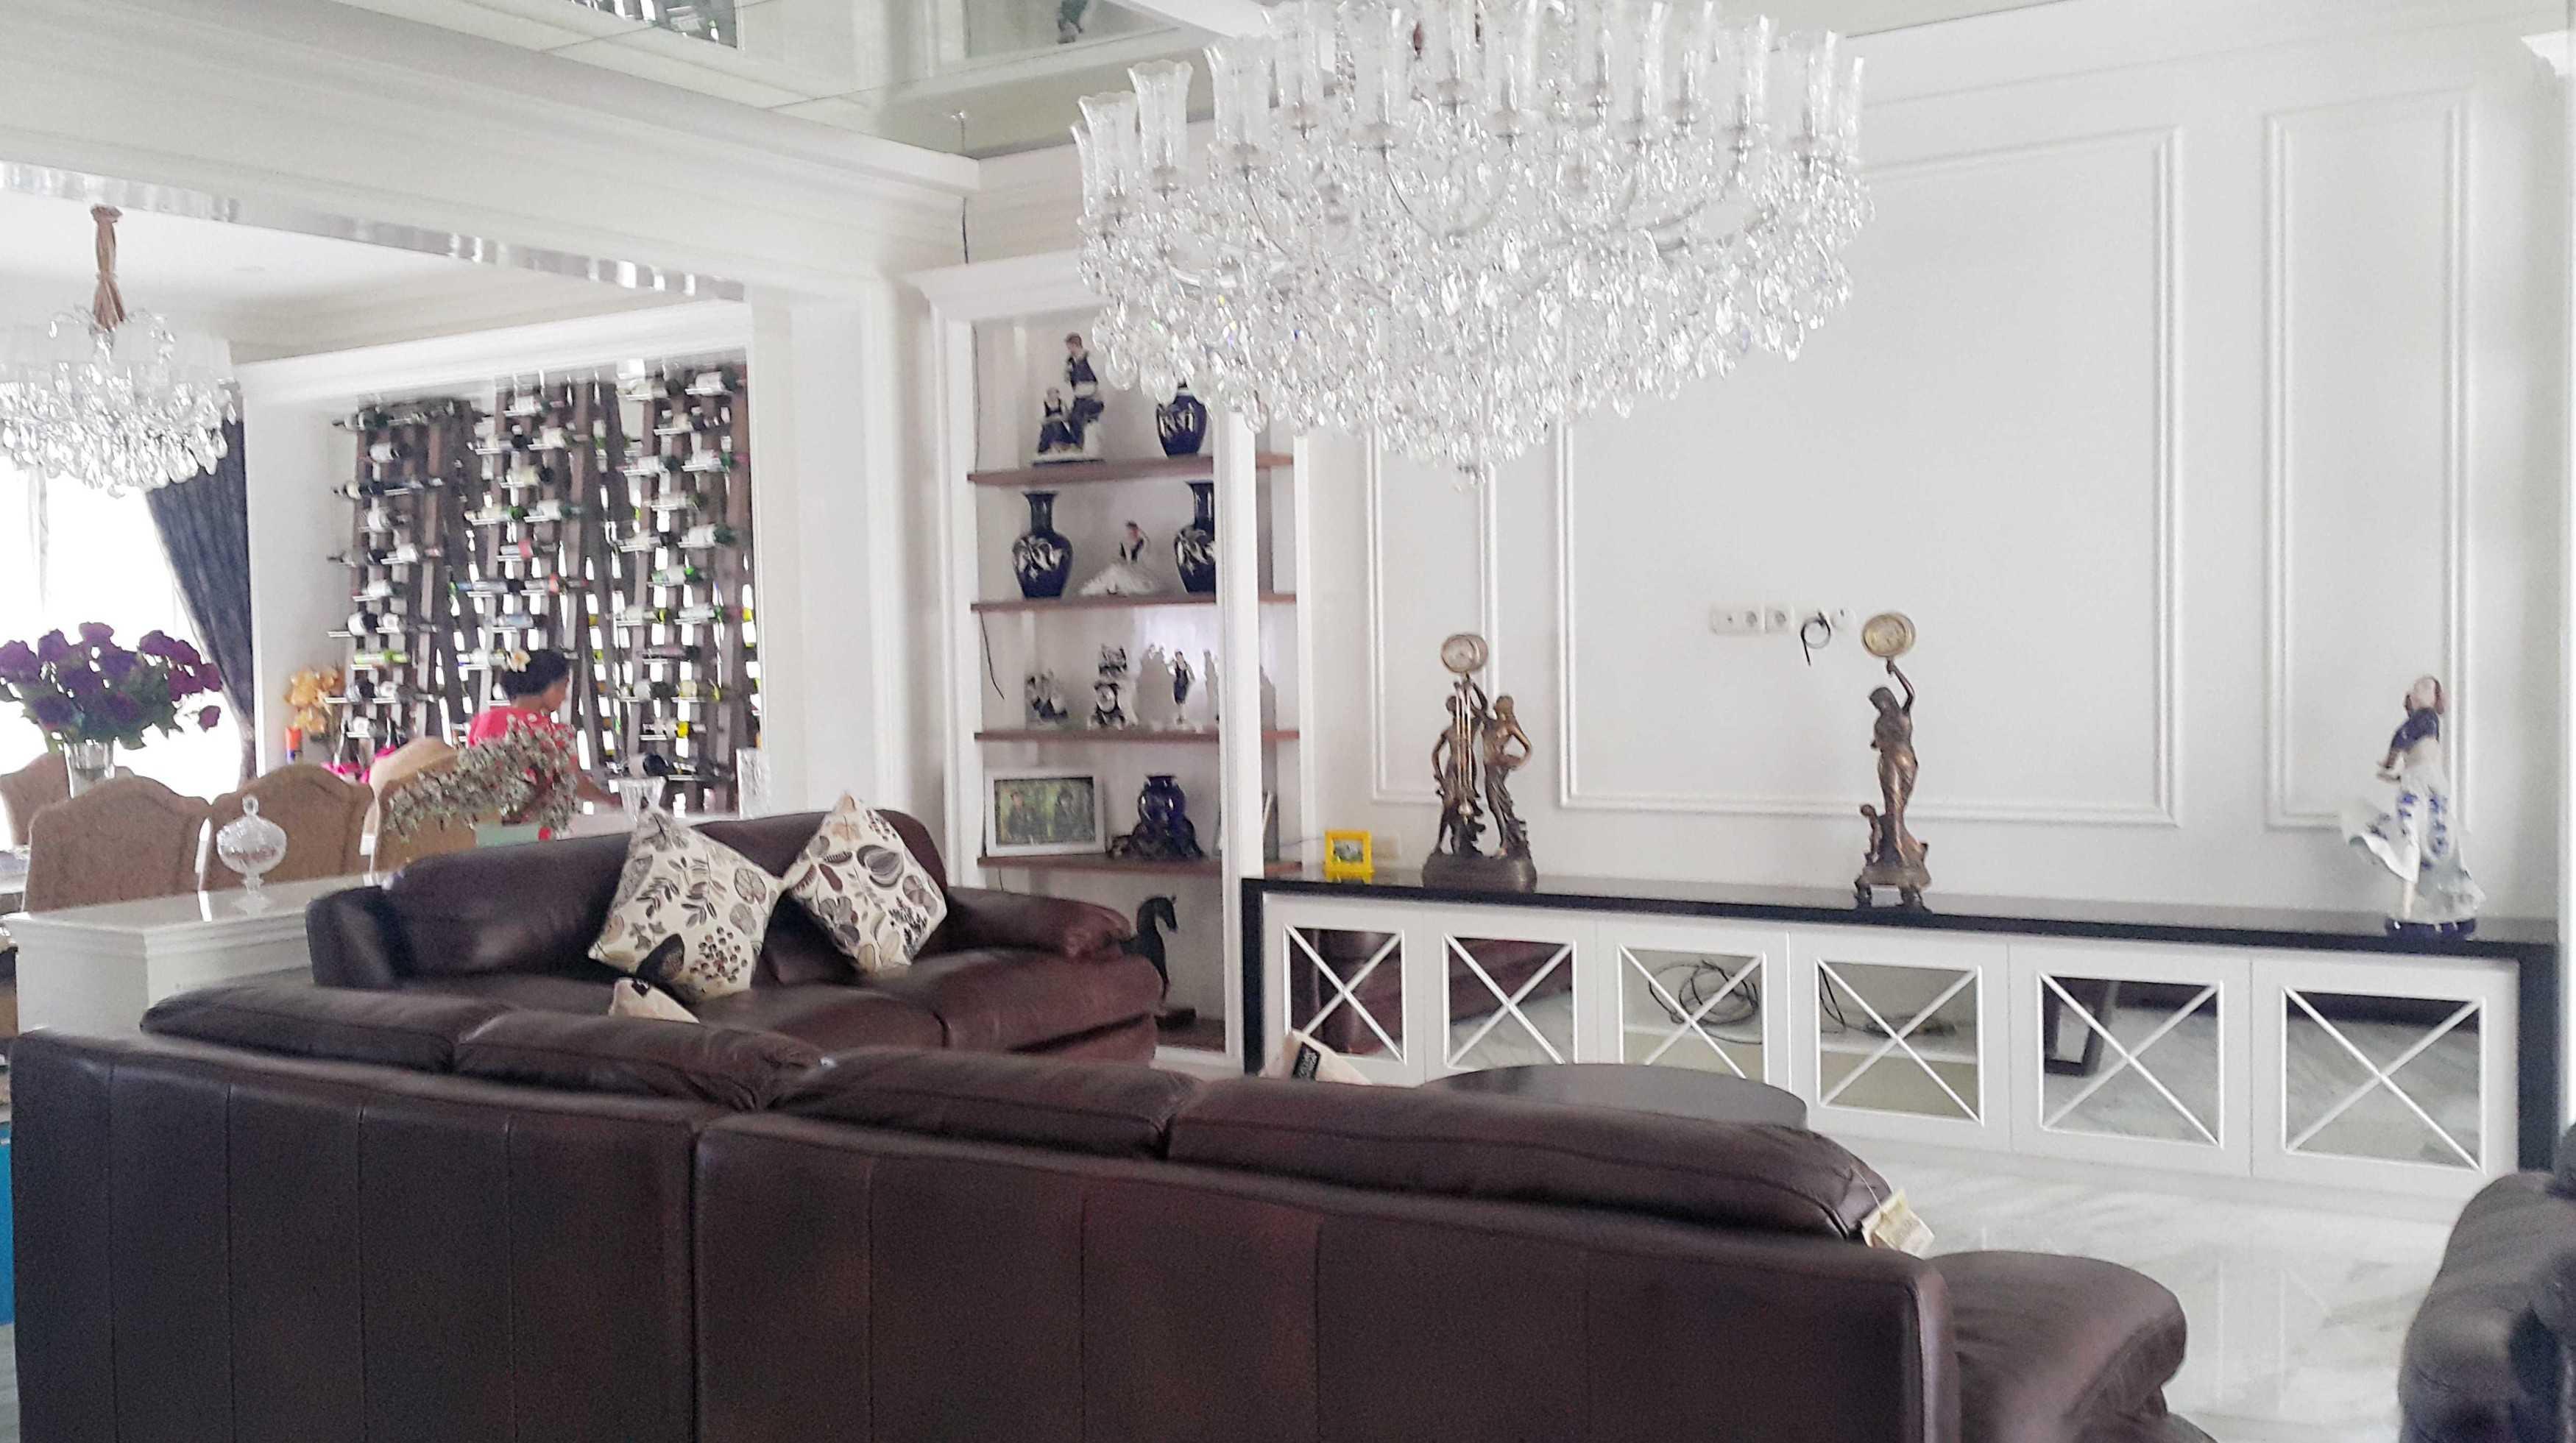 7Design Architect Mr. H House At Spring Hill Spring Hill Golf Residence, Kemayoran Spring Hill Golf Residence, Kemayoran Living Room Klasik  18534